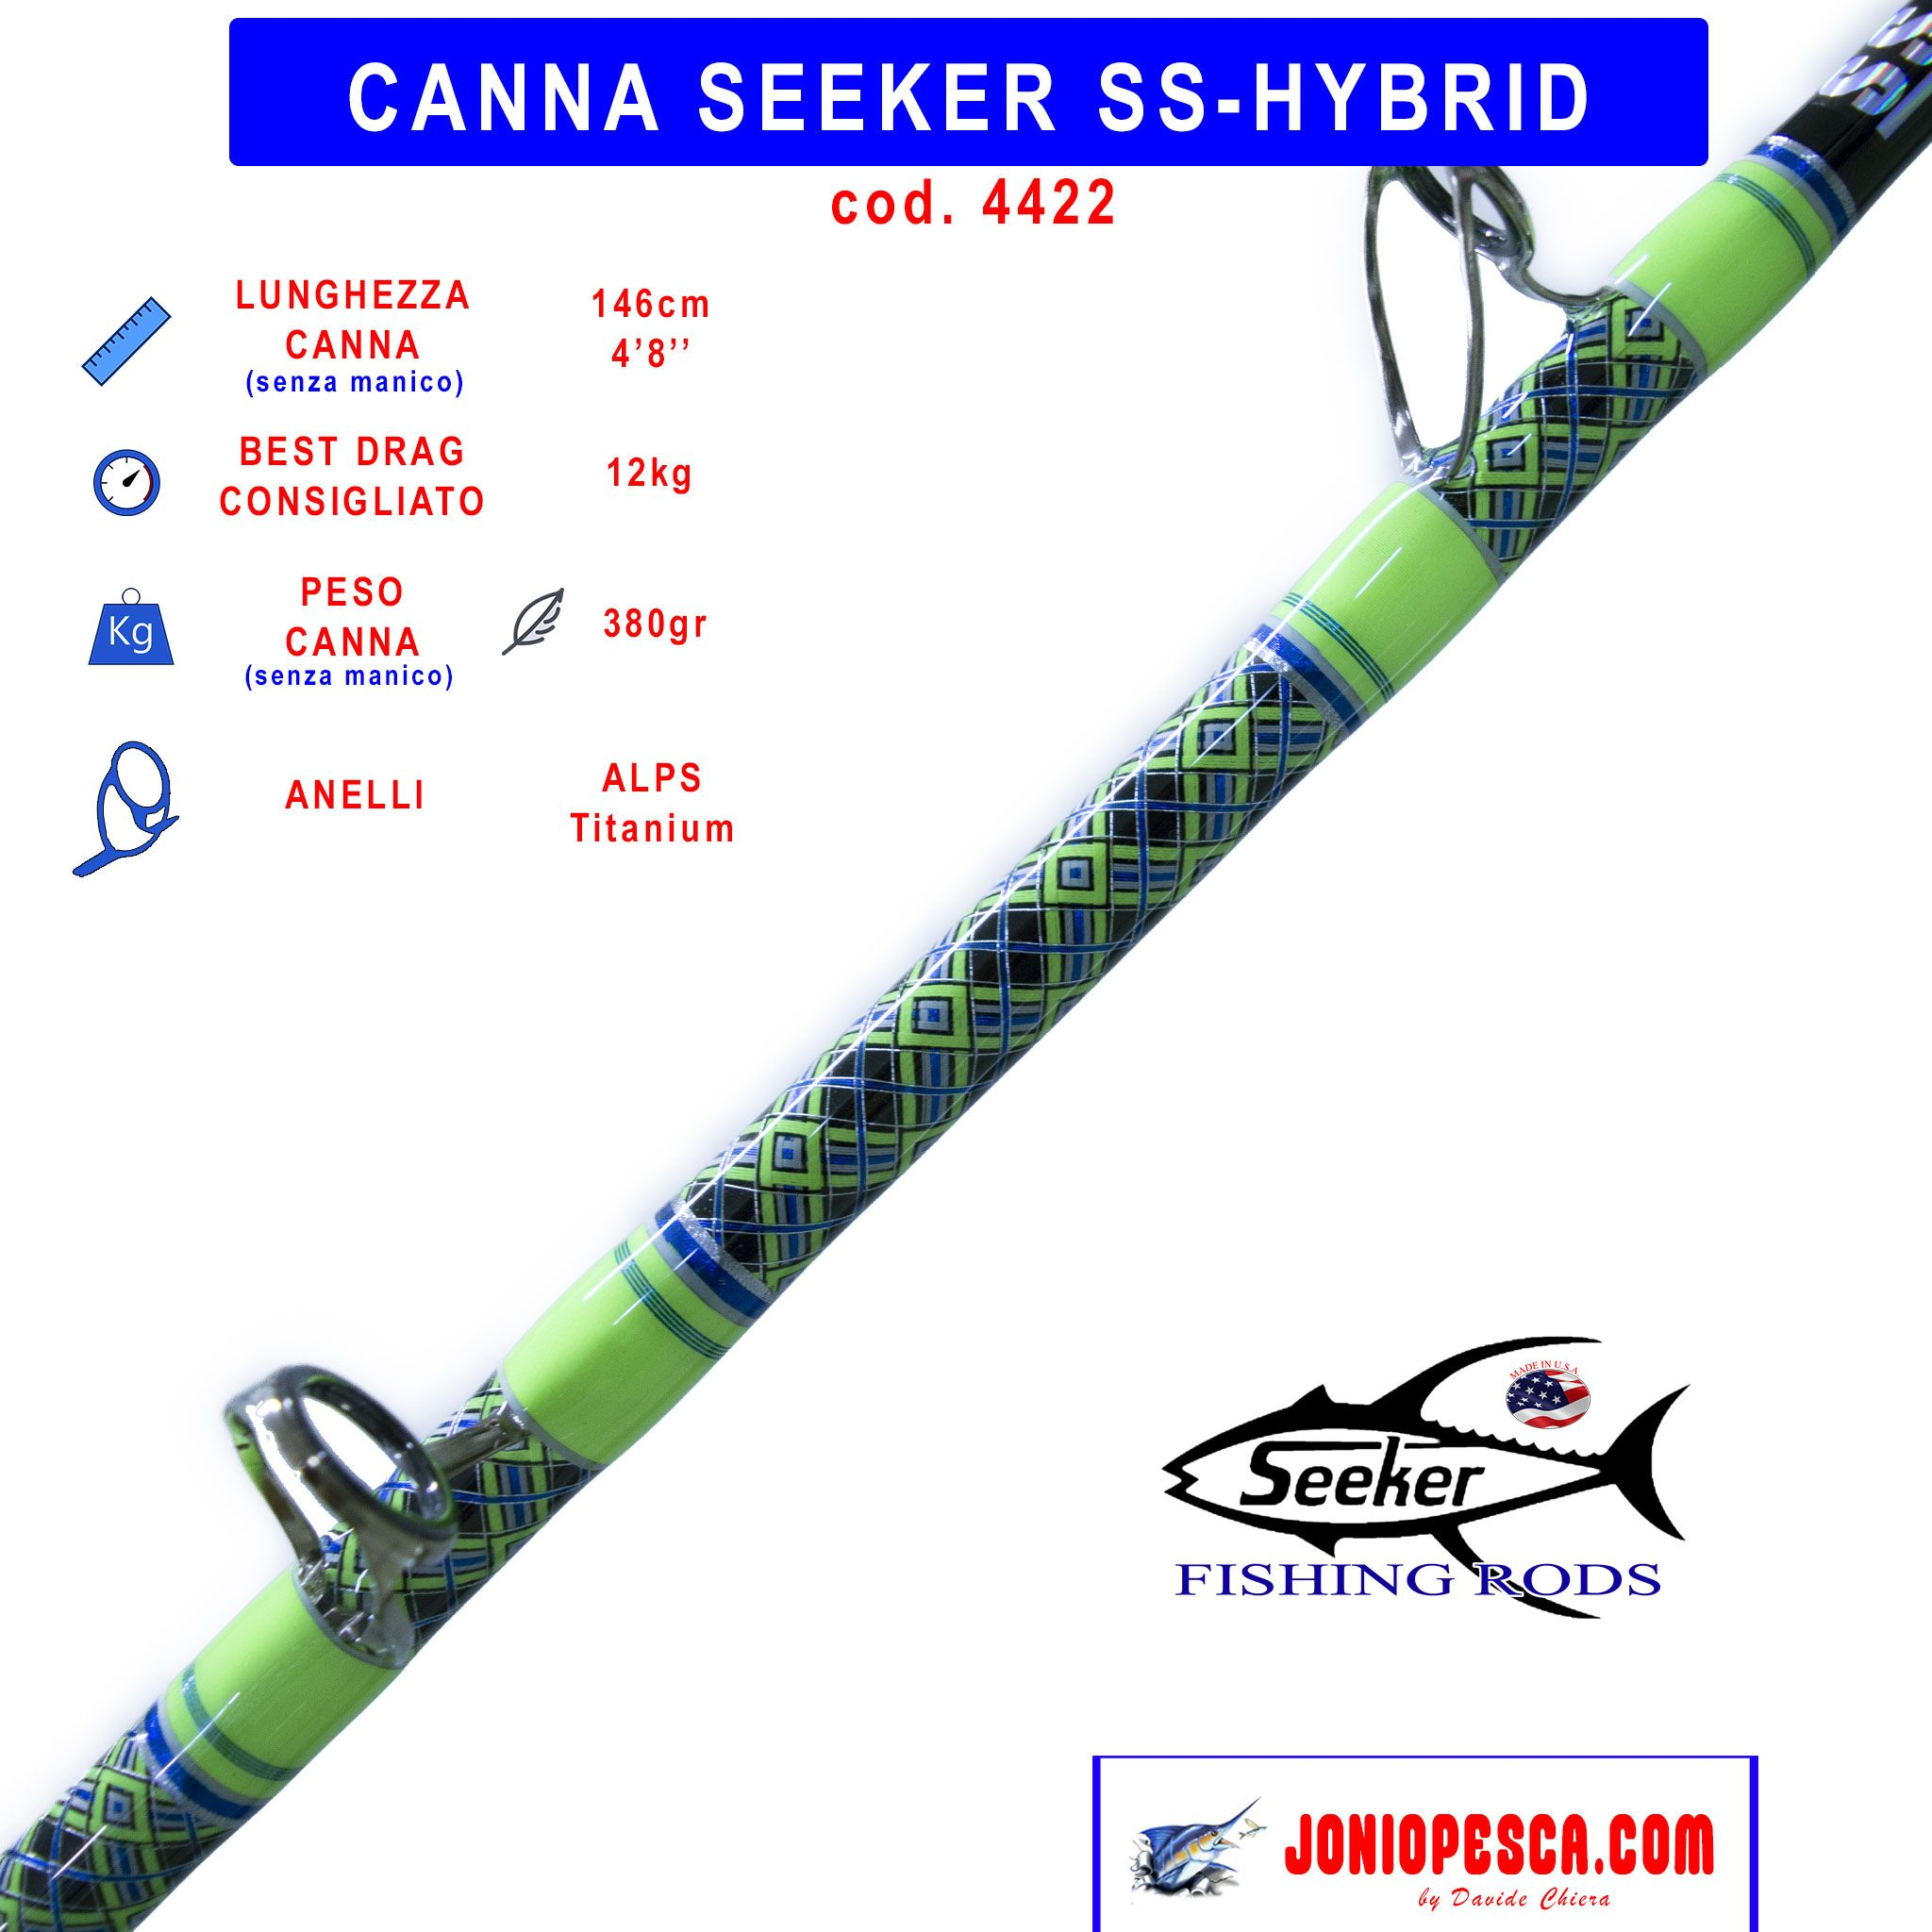 canna-seeker-ss-hybrid-4422-6